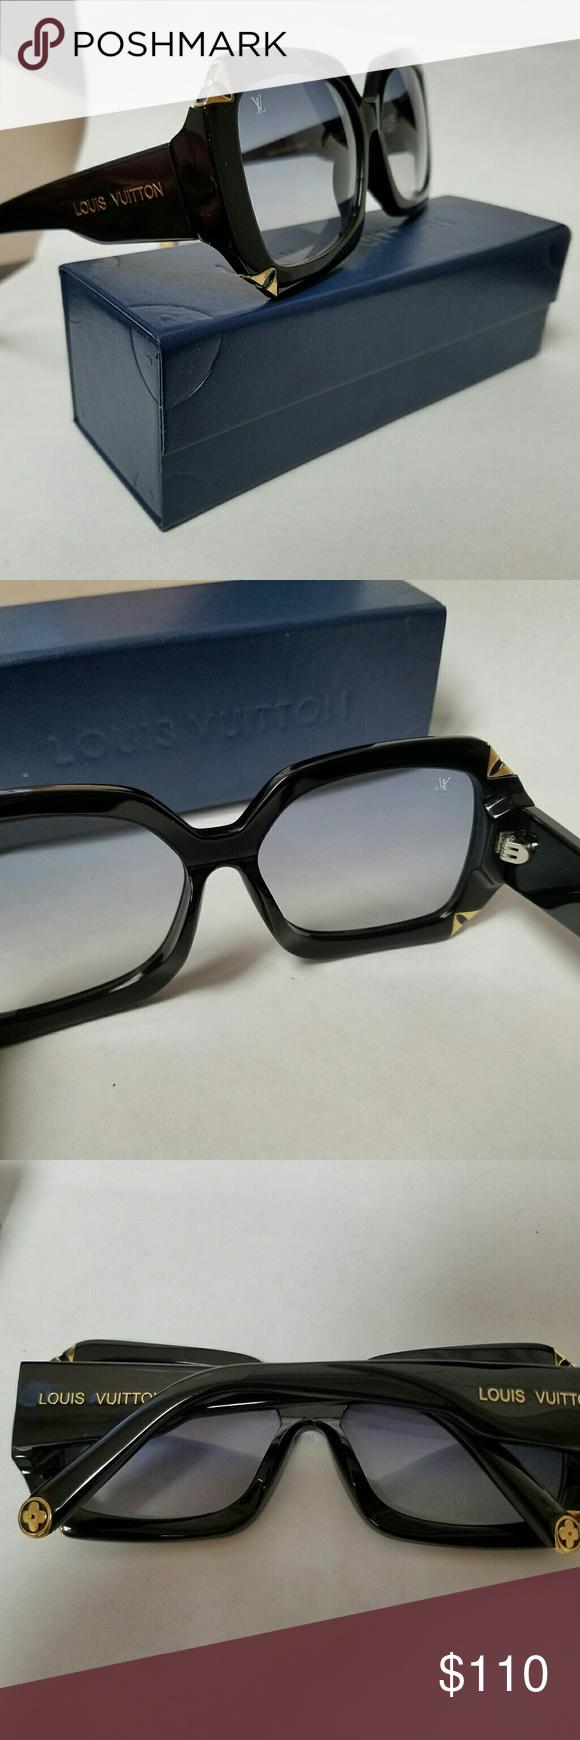 e380b2e44b Lightly Used Authentic Louis Vuitton Sunglasses. Super clean